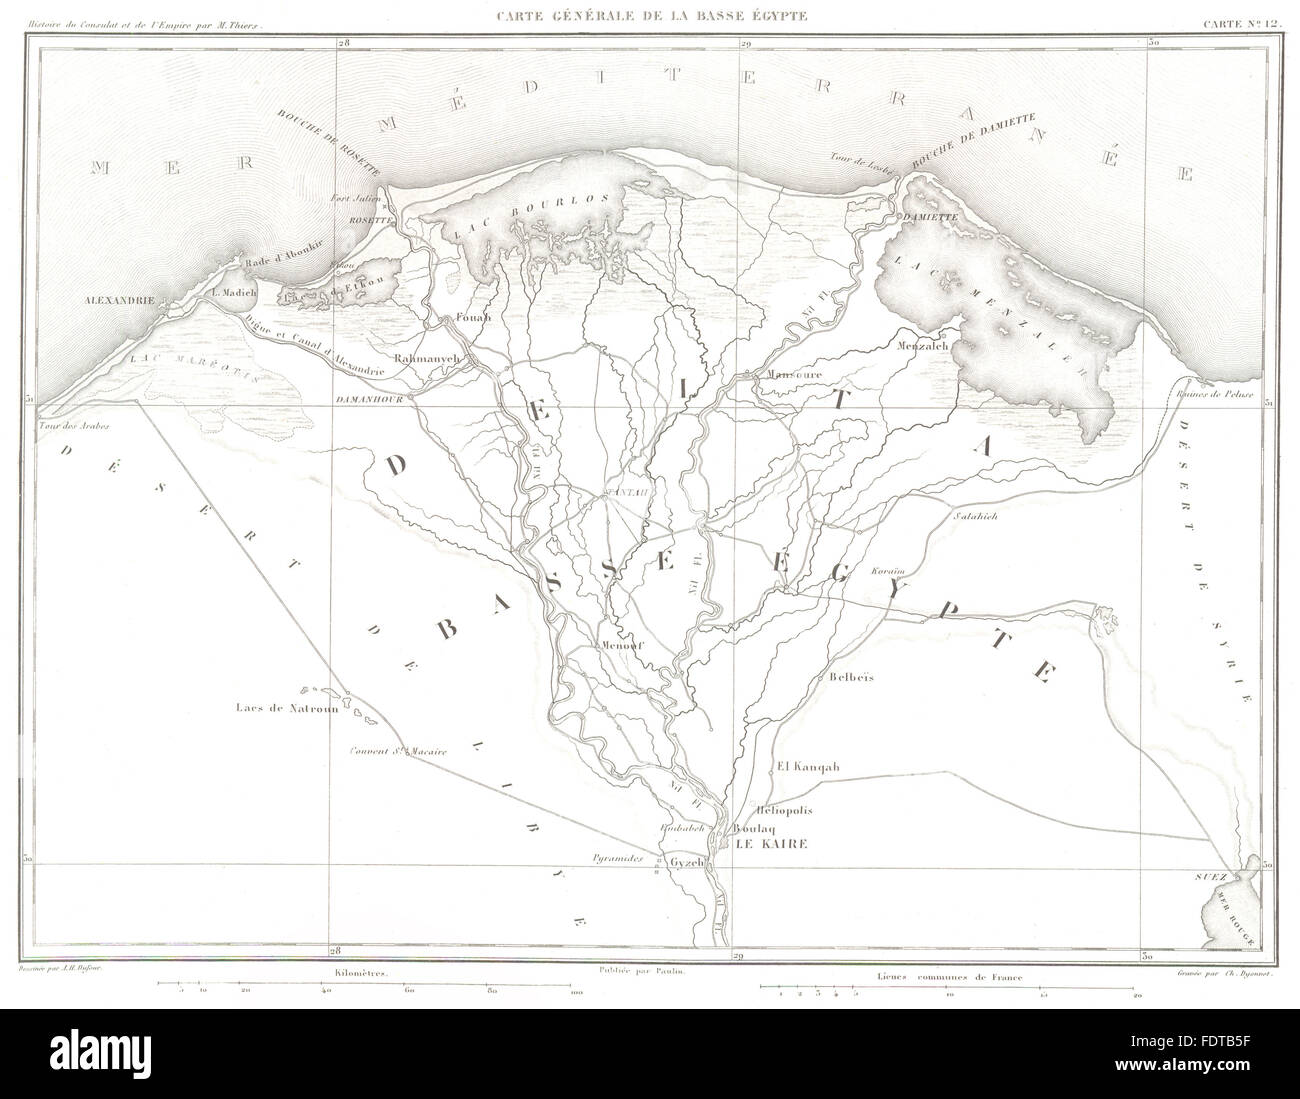 EGYPT: NILE DELTA: Basse Egypte. Kaire Cairo Alexandrie, 1859 antique map - Stock Image